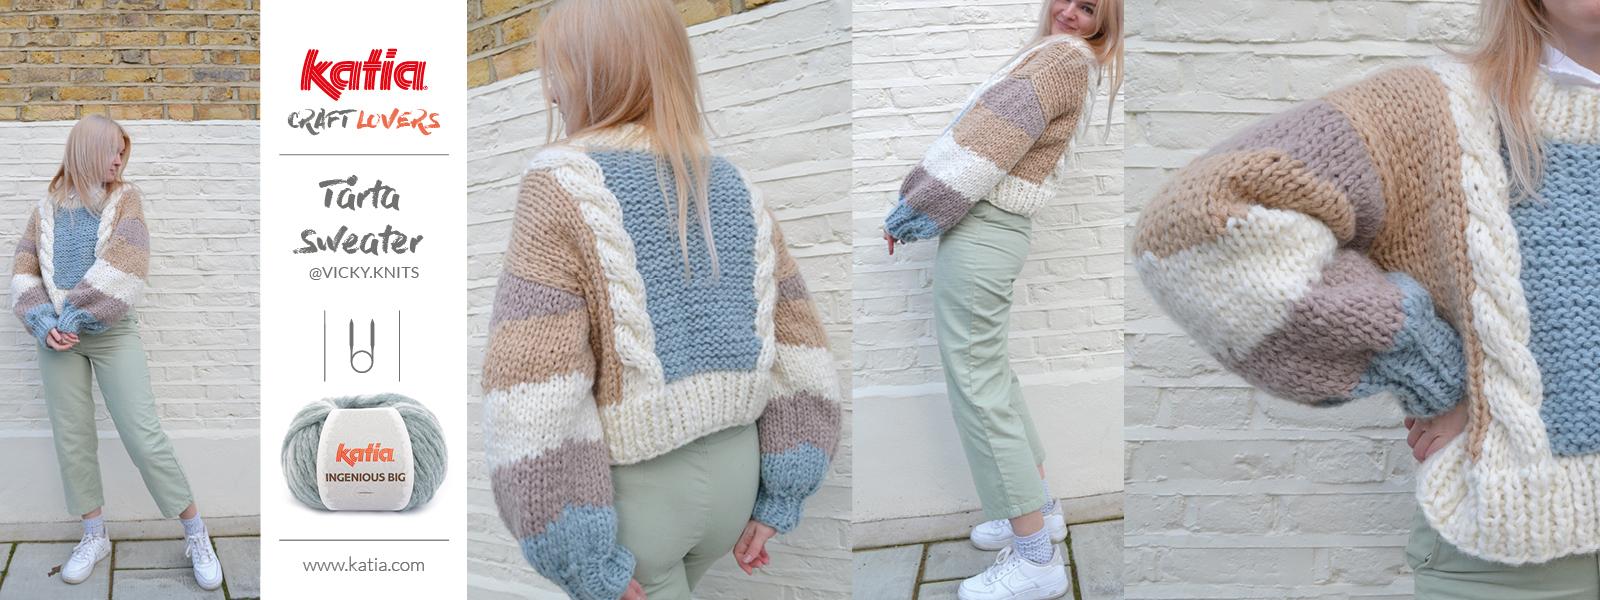 maglia bottom-up